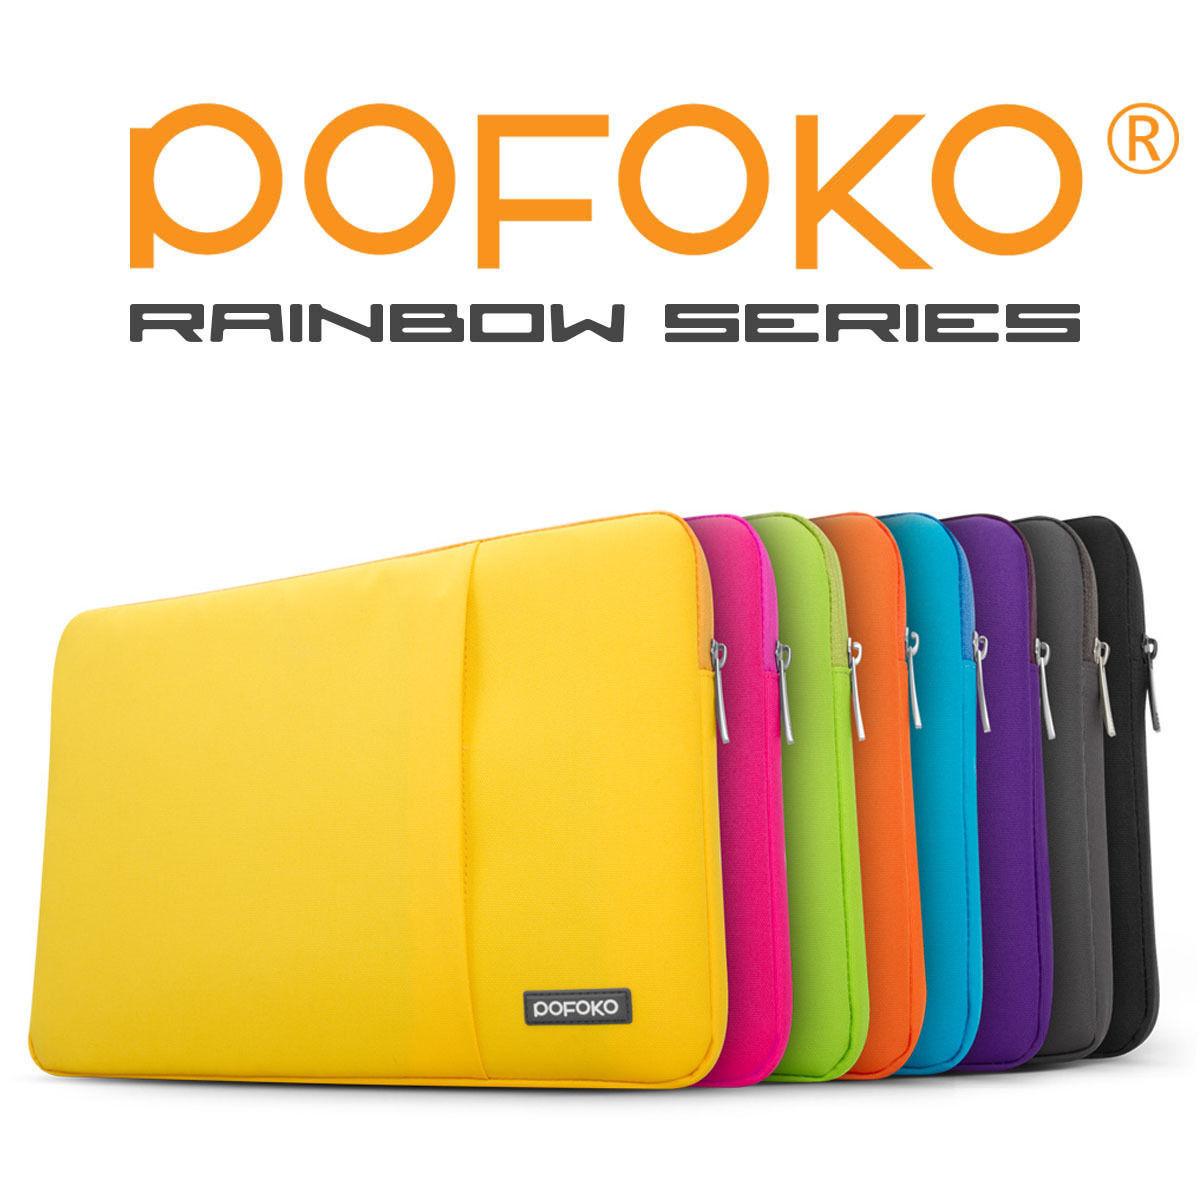 "POFOKO Waterproof anti fall laptop sleeve bag case cover pouch skins For Apple Macbook Pro Air Reina TouchBar 11 12 13 15 16 17"""